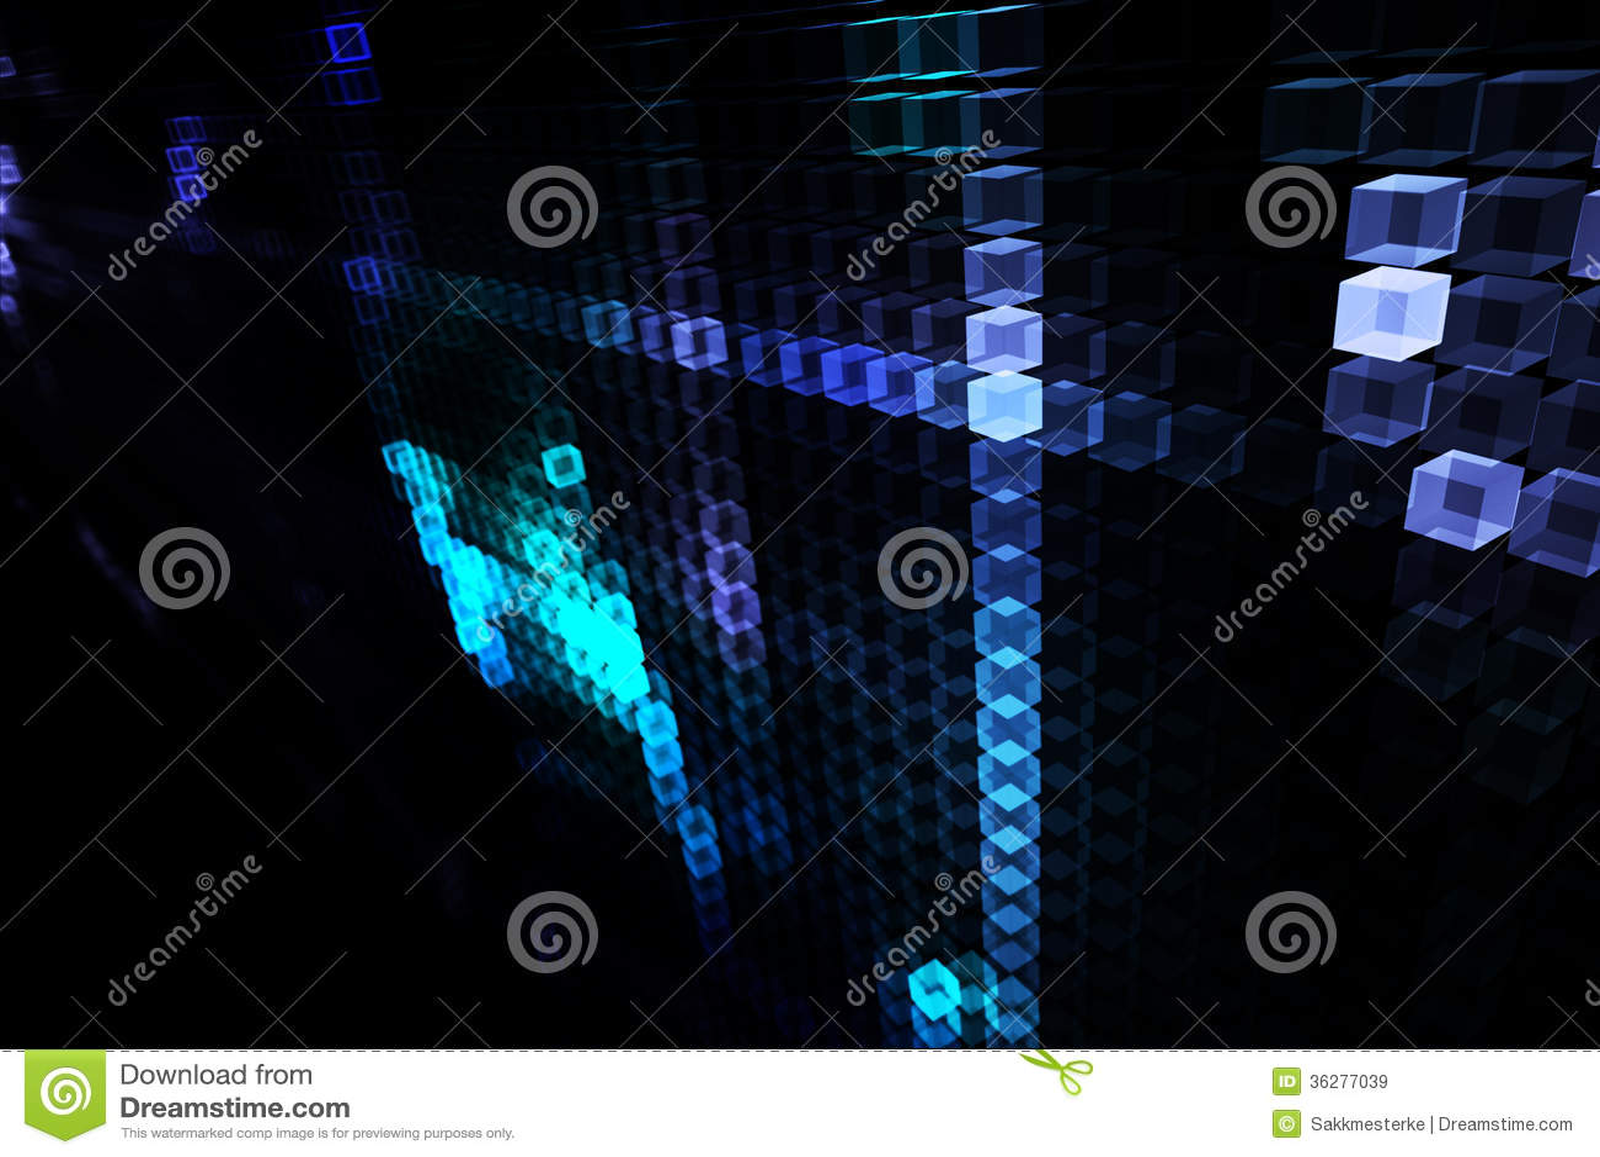 Mass surveillance royalty free stock images image 36277039 - Surveillance wallpaper ...